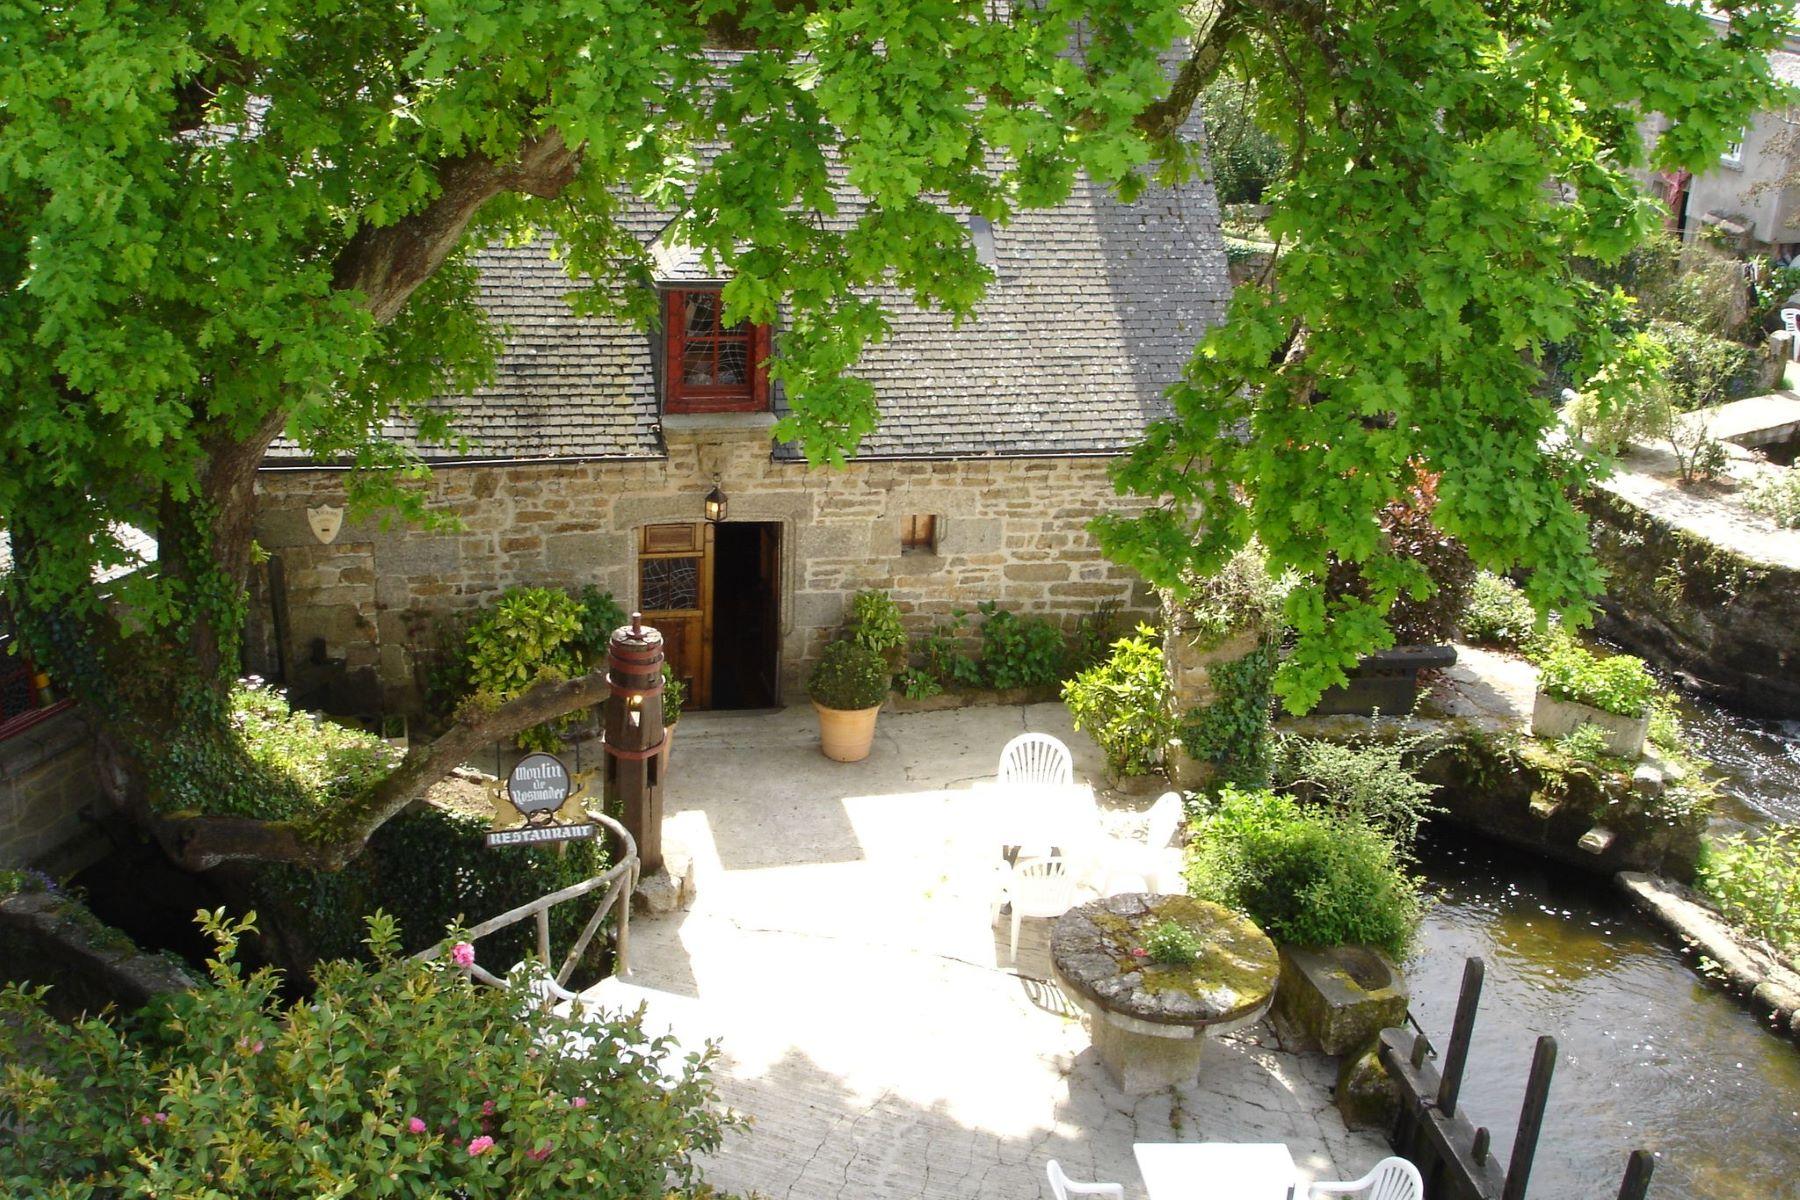 Частный односемейный дом для того Продажа на South Finistery. Beautiful property near the river... Other Brittany, Бретань, 29930 Франция